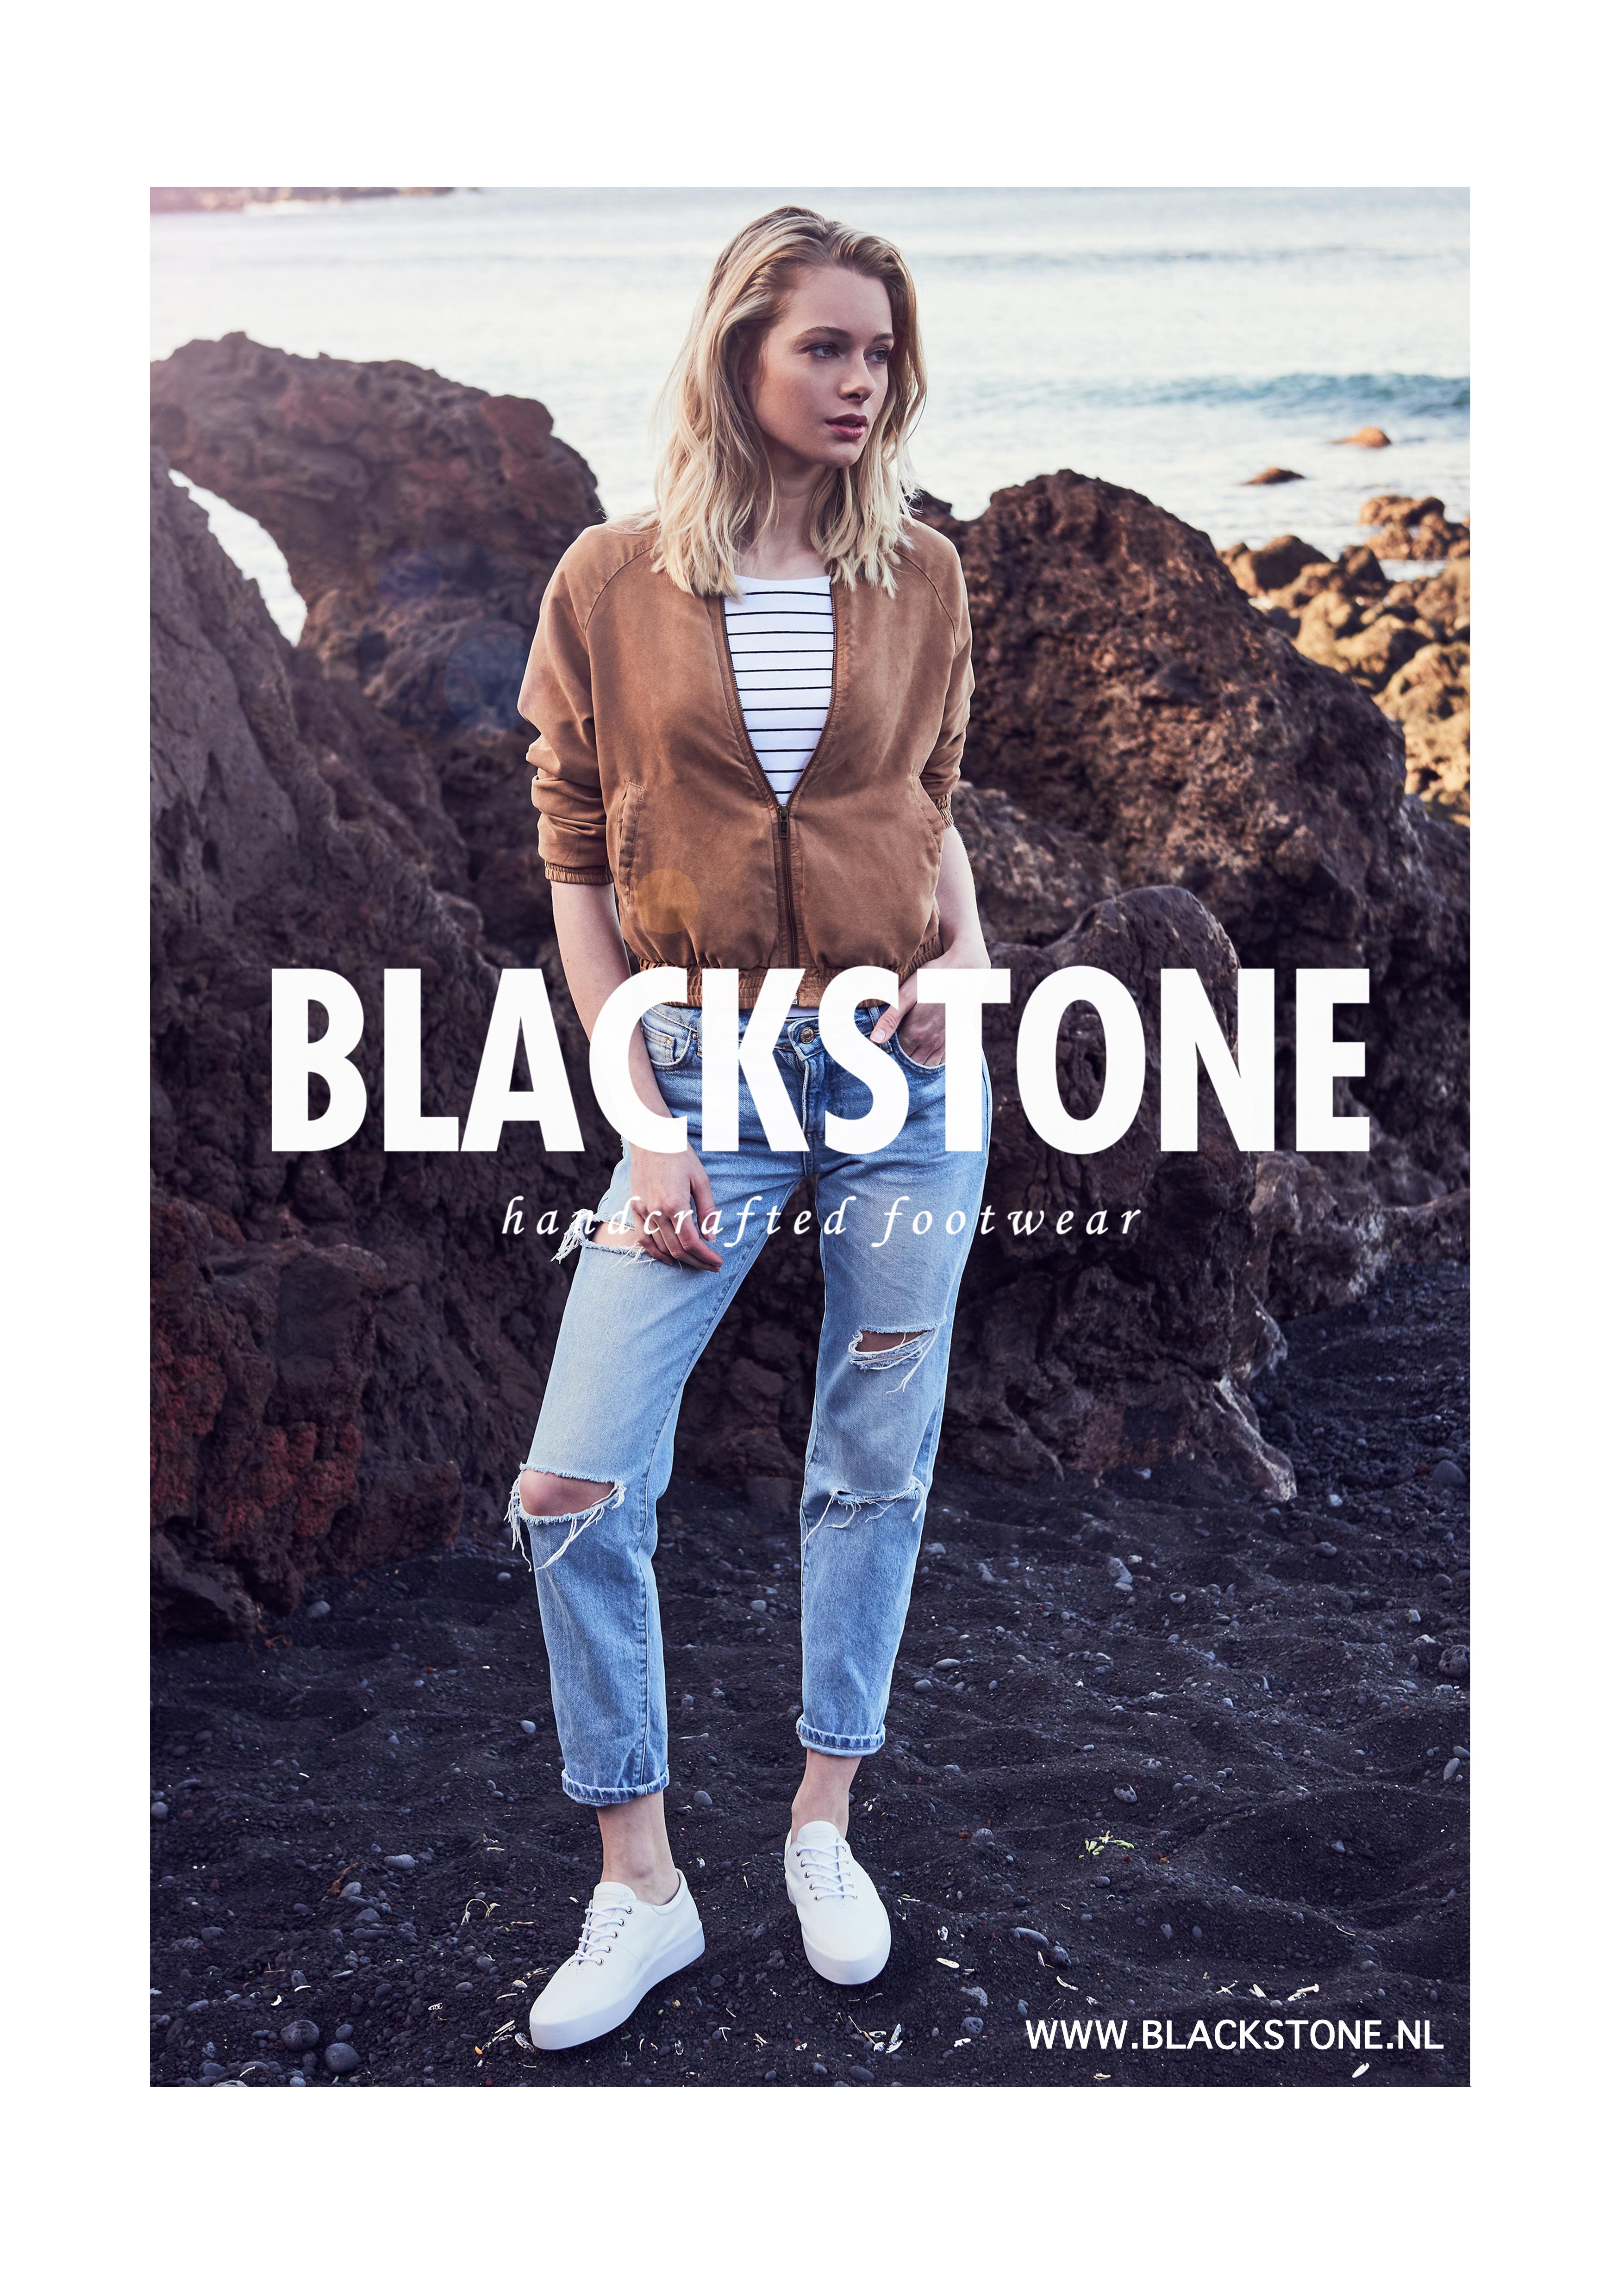 blackstone ad6